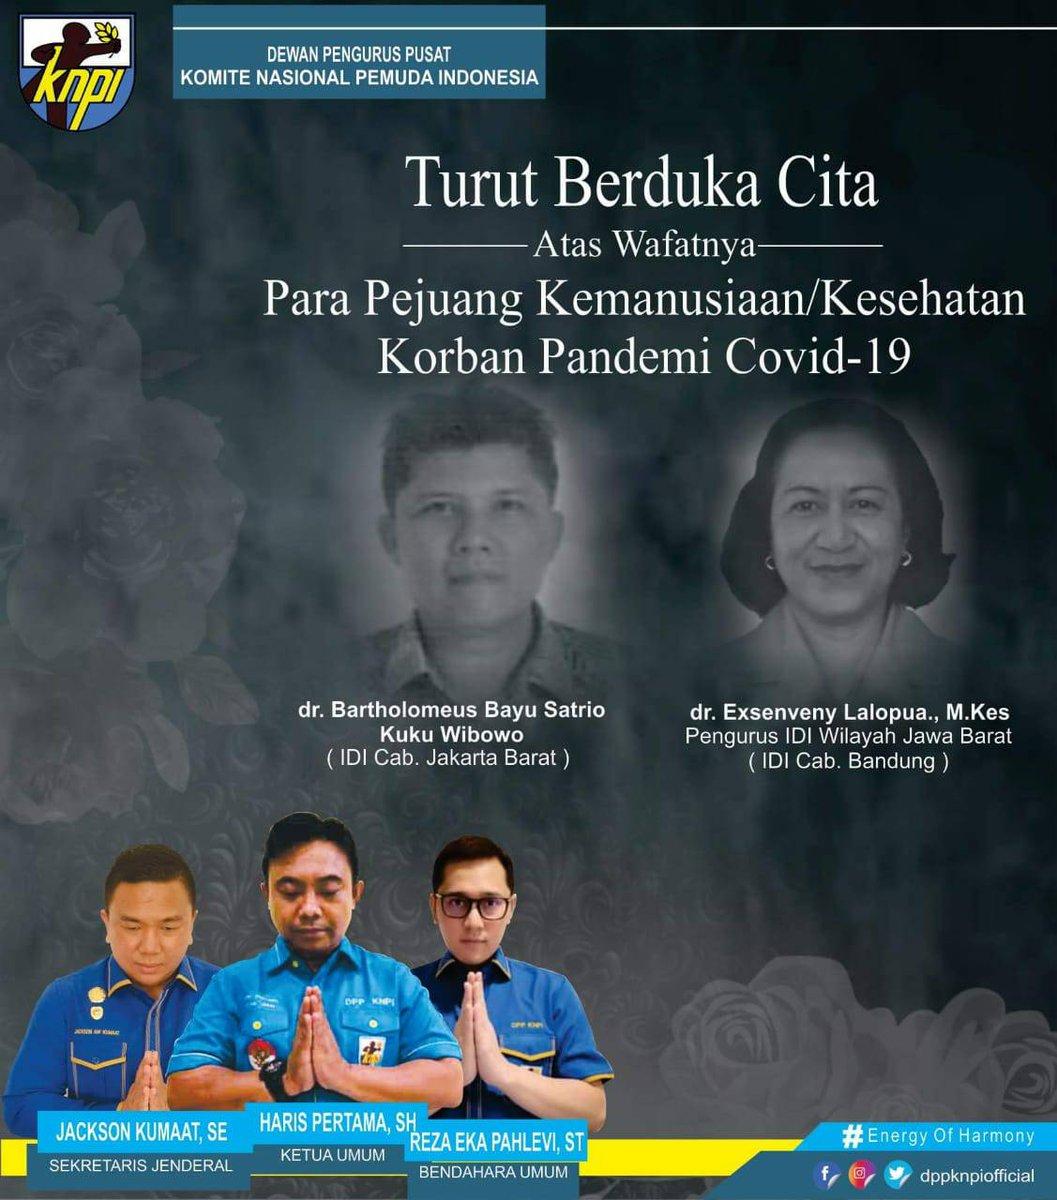 Turut Berduka Cita  dr. Bartholomeus Bayu Satrio Kuku Wibowo (IDI Cab. Jakarta Barat) dr. Exsenveny Lalopua., M.Kes (Pengurus IDI Wilayah Jawa Barat) (IDI Cab. Bandung)  Terimakasih yang tak terhingga utk segala Pengorbanan & Keikhlasan  @bung_HP @jacksonkumaat  #KNPI  #DPPKNPIpic.twitter.com/tV8T2GviAY